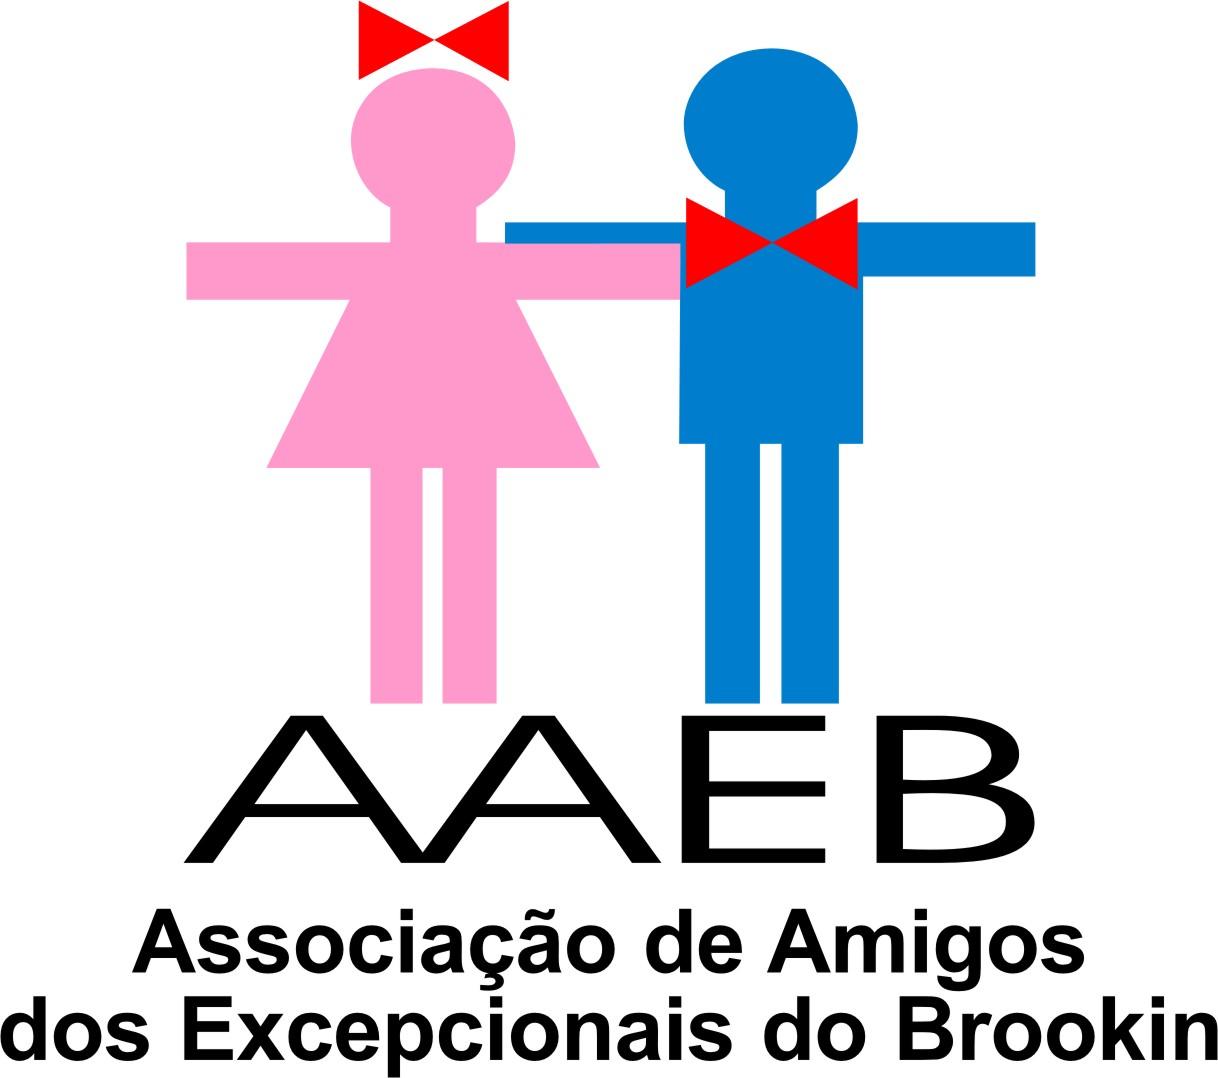 ASSOCIACAO DE AMIGOS DOS EXCEPCIONAIS DO BROOKLIN